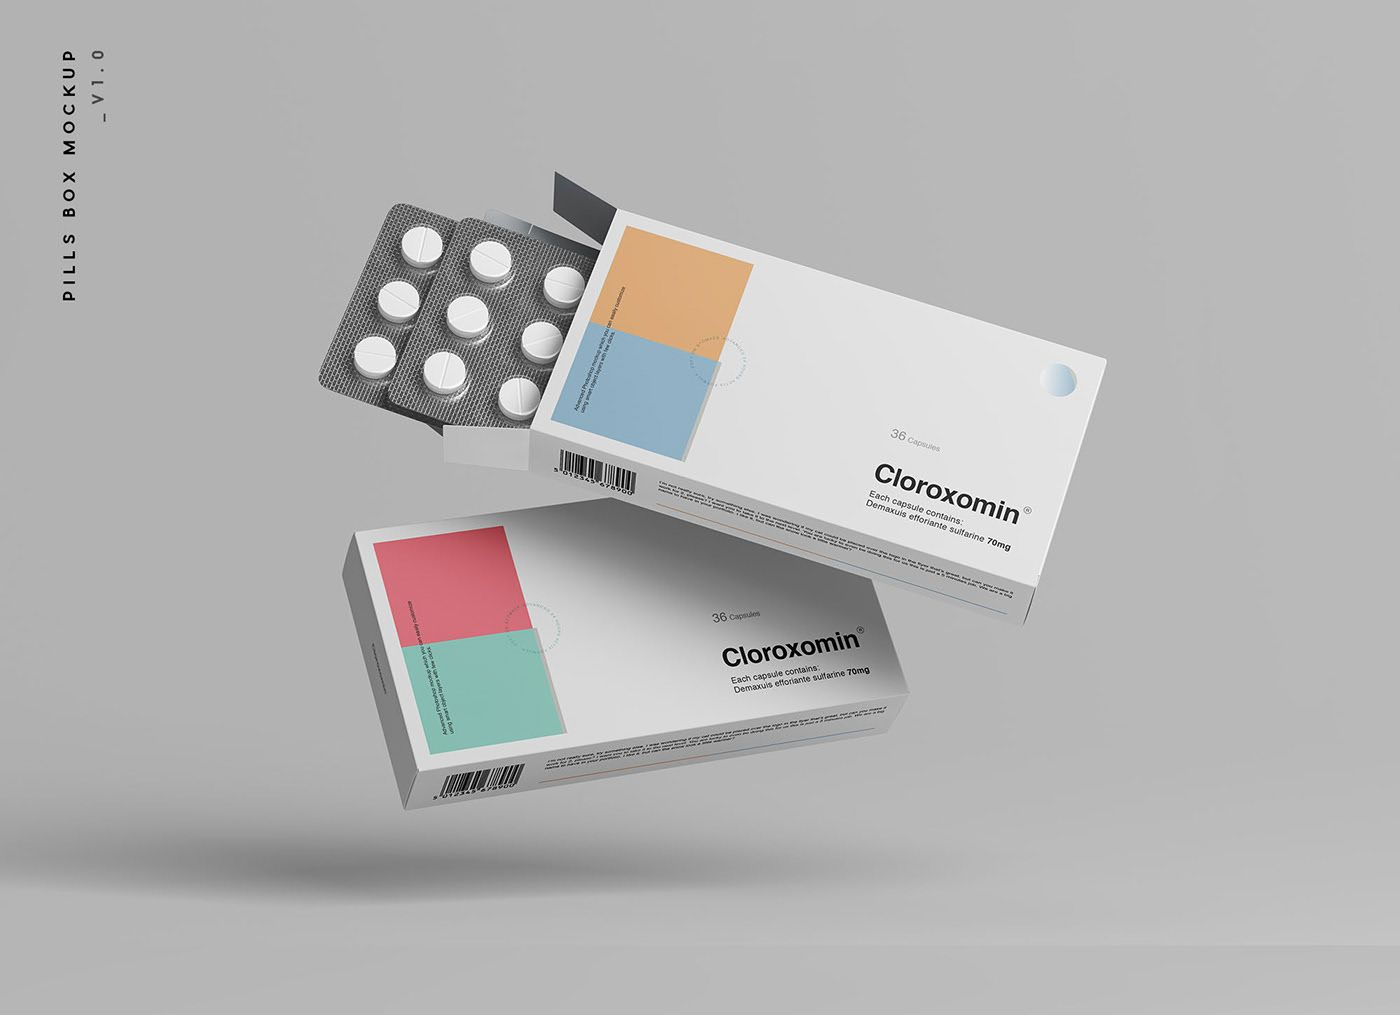 Download Pills Box Packaging Mockup On Behance Packaging Mockup Box Mockup Pill Packaging Design